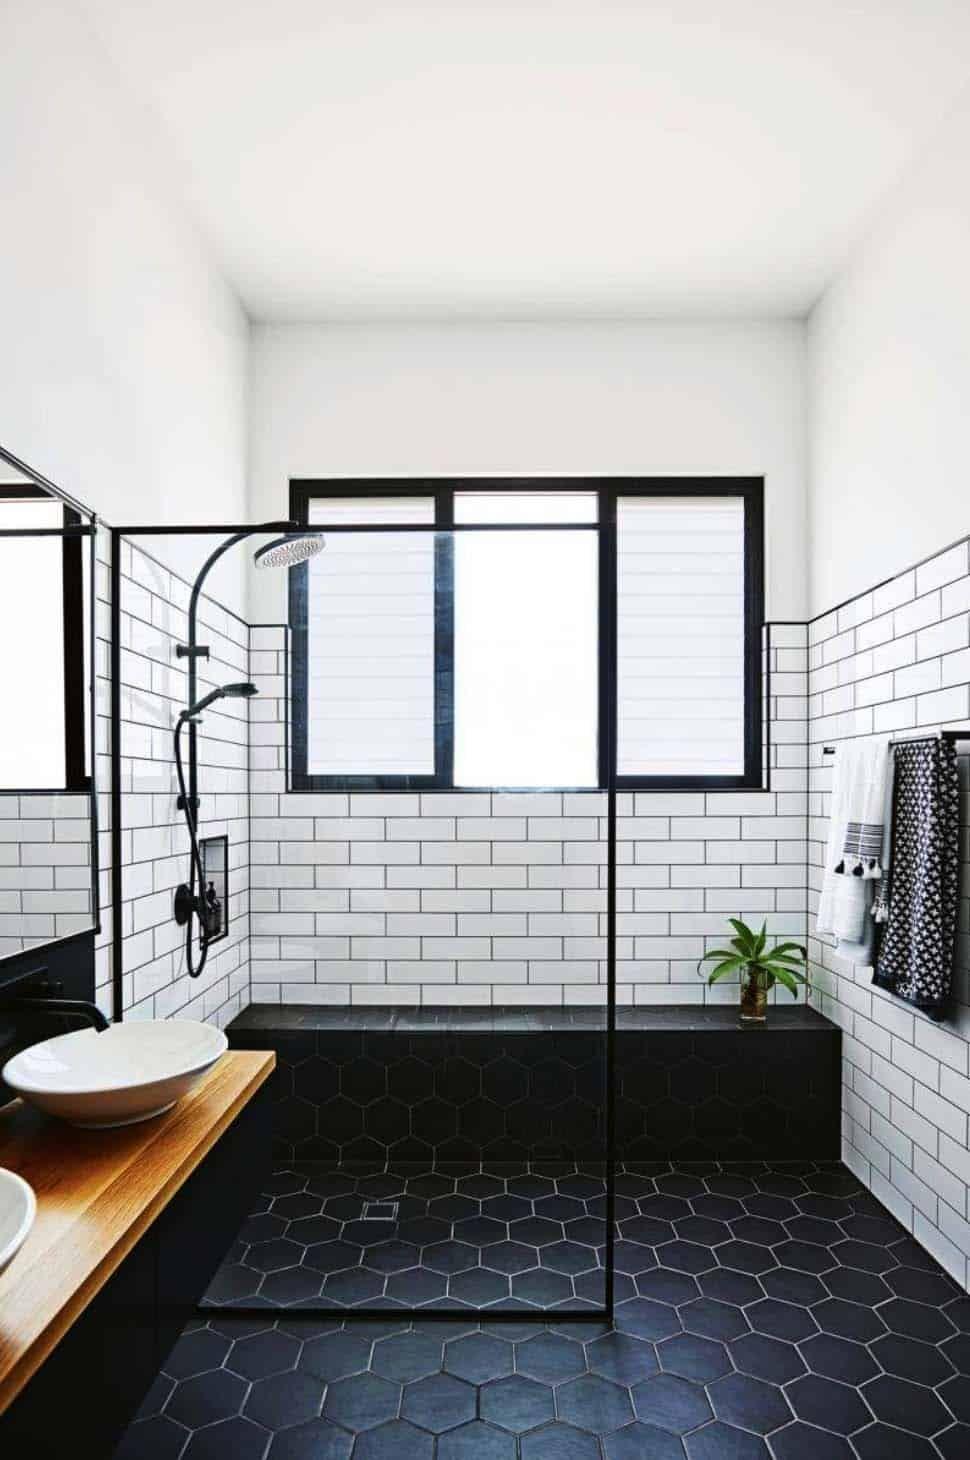 25 Incredibly Stylish Black And White Bathroom Ideas To Inspire Bathroom Interior Design Black Bathroom Small Bathroom Remodel Black and white bathroom floor